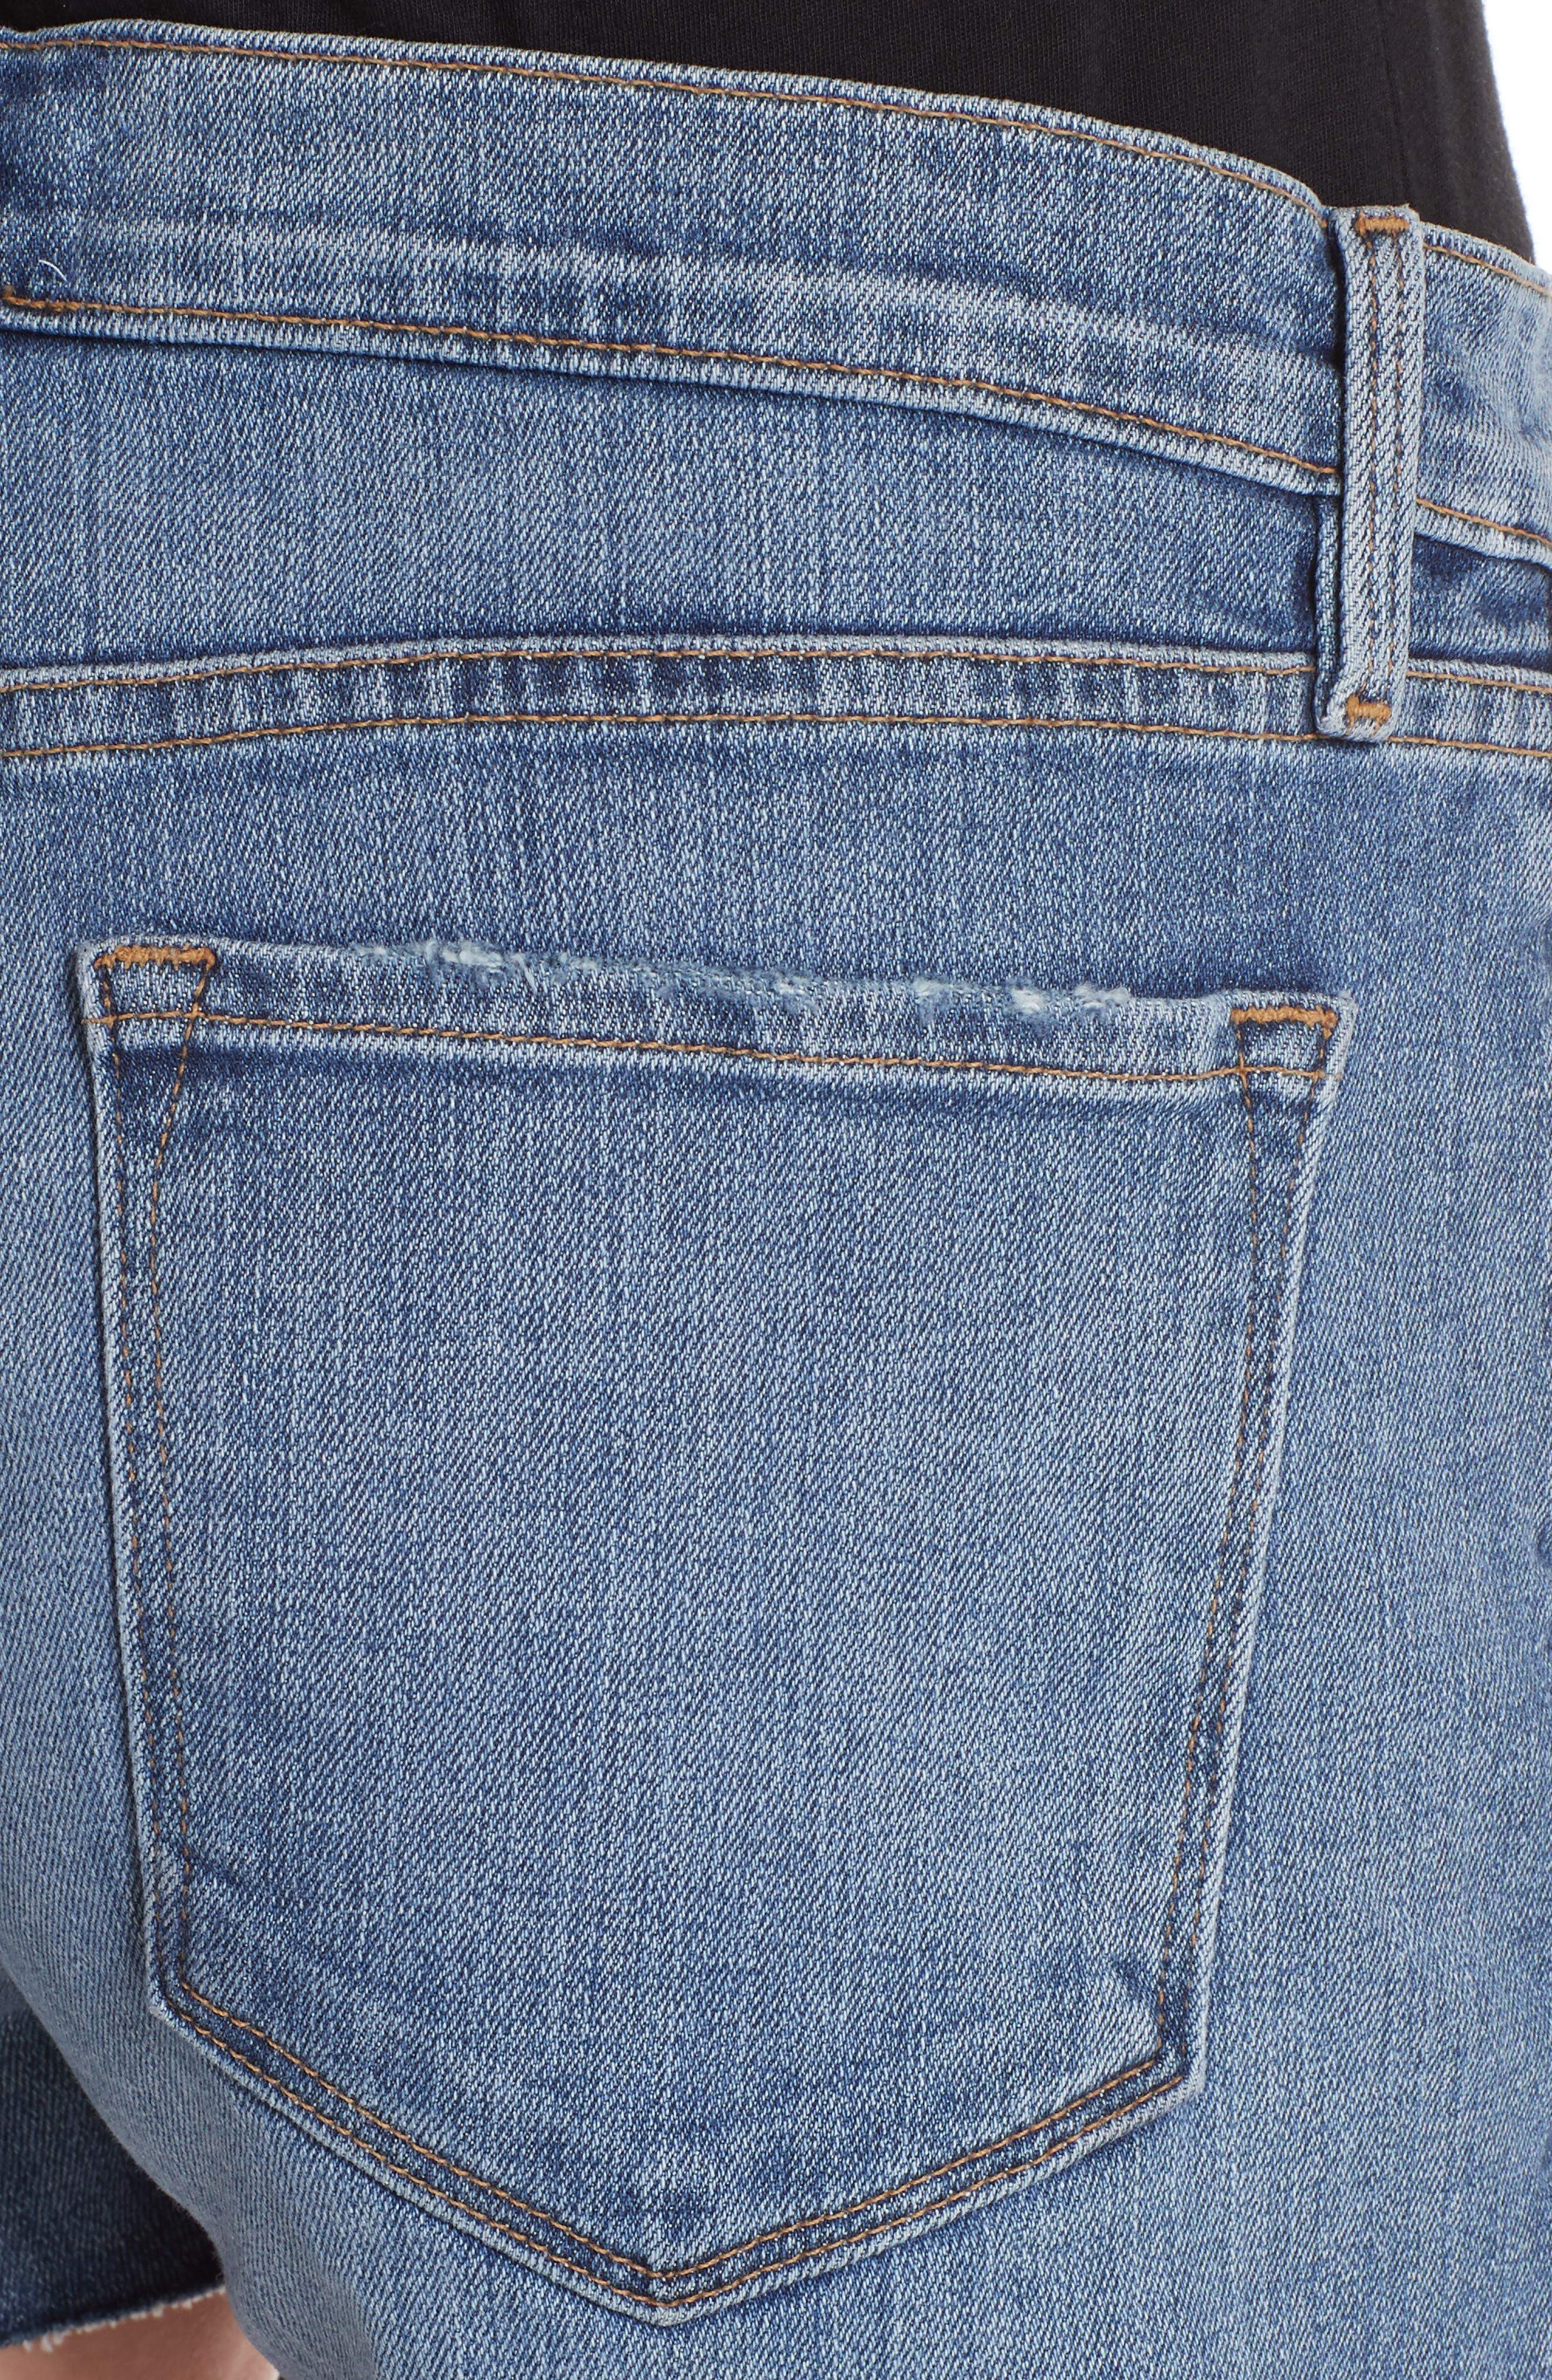 Le Cutoff Center Seam Denim Shorts,                             Alternate thumbnail 4, color,                             420